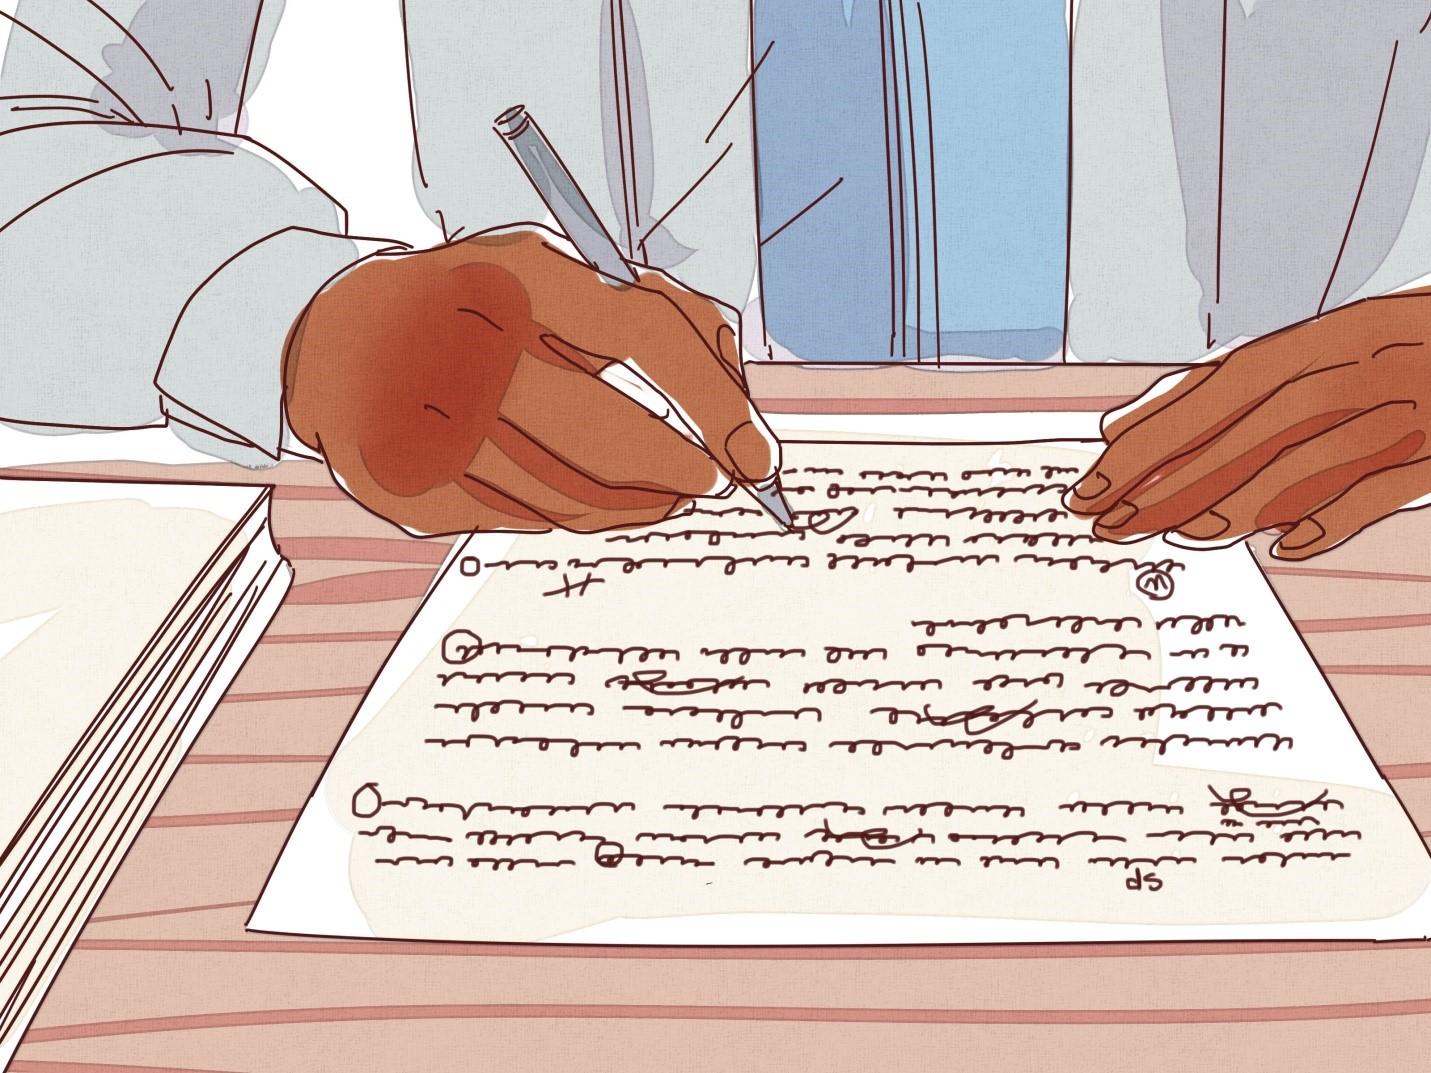 Censorship persuasive essay